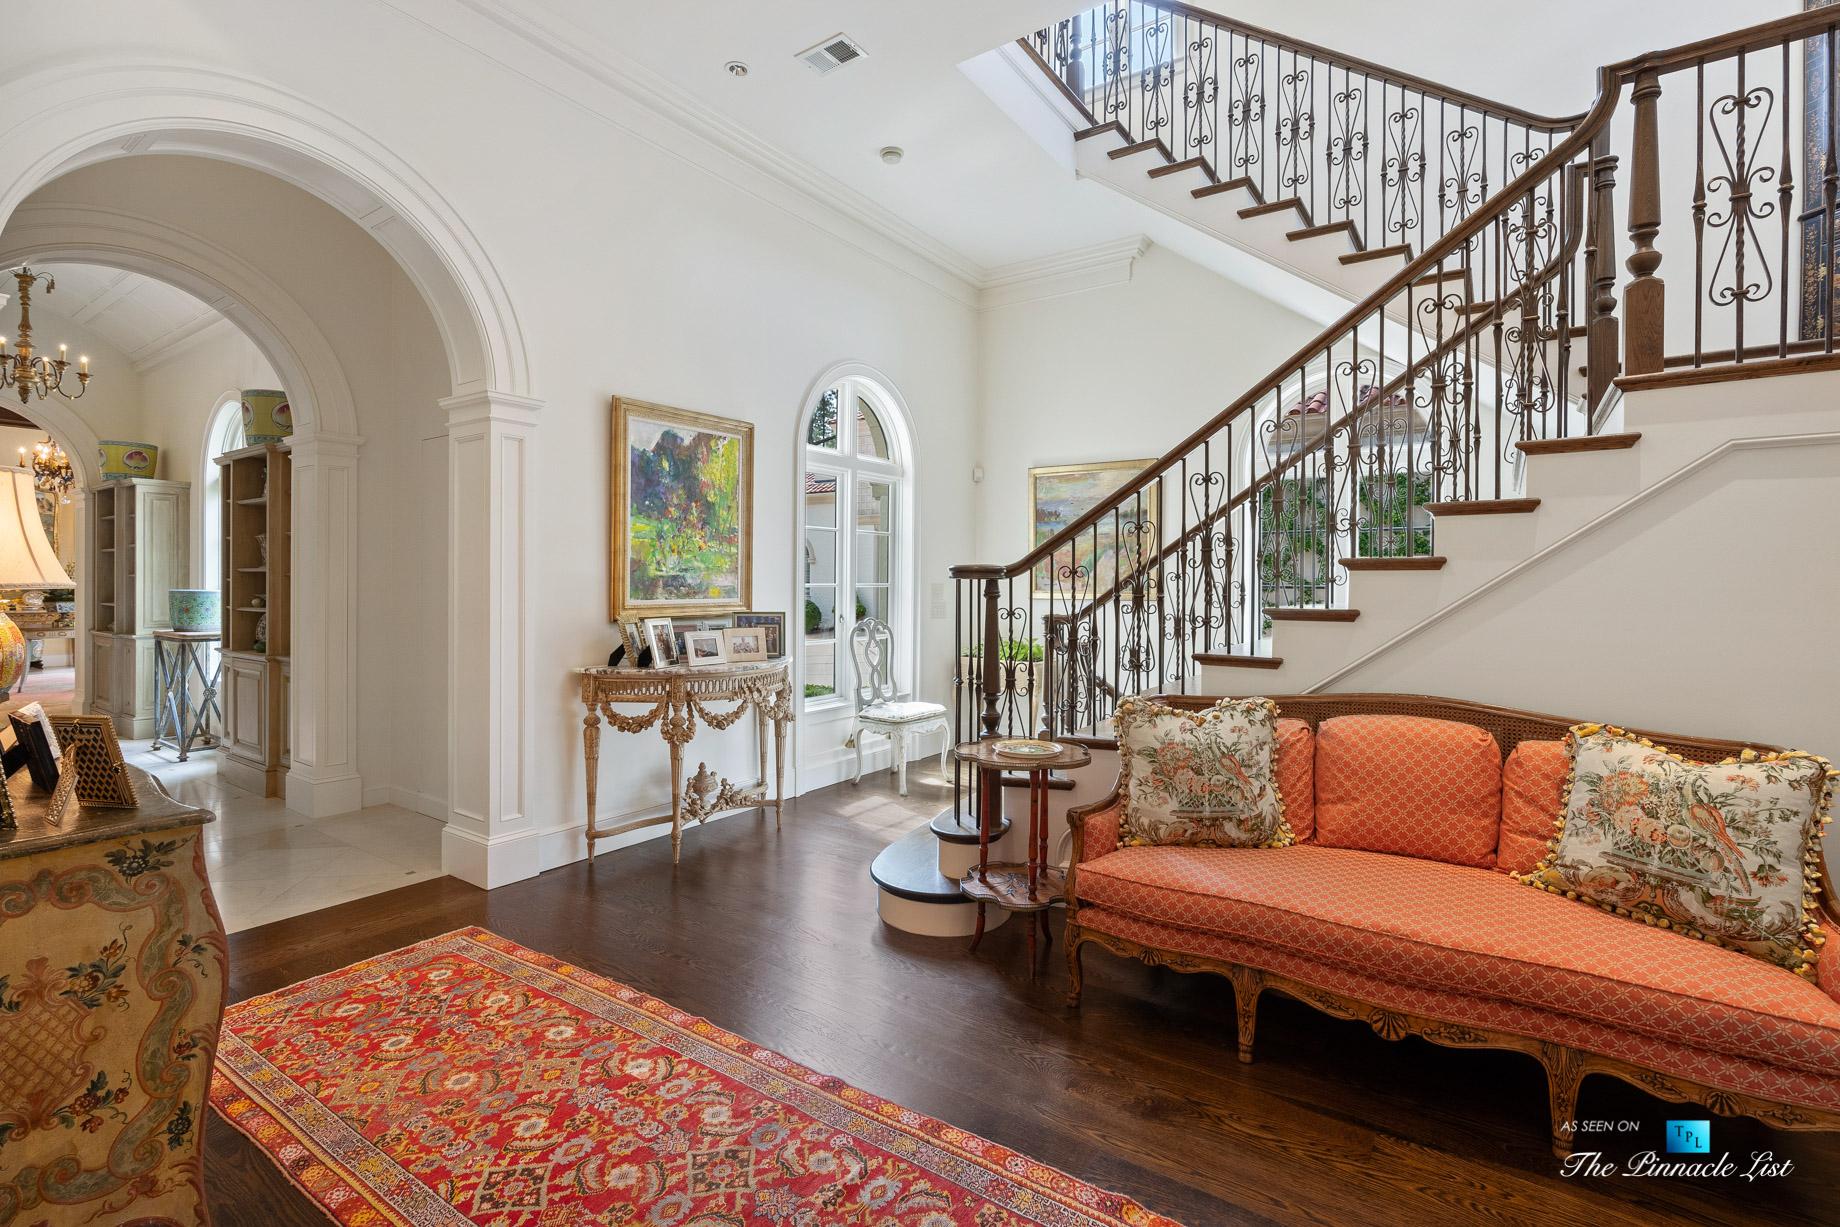 439 Blackland Rd NW, Atlanta, GA, USA – Main House Stairs – Luxury Real Estate – Tuxedo Park Mediterranean Mansion Home